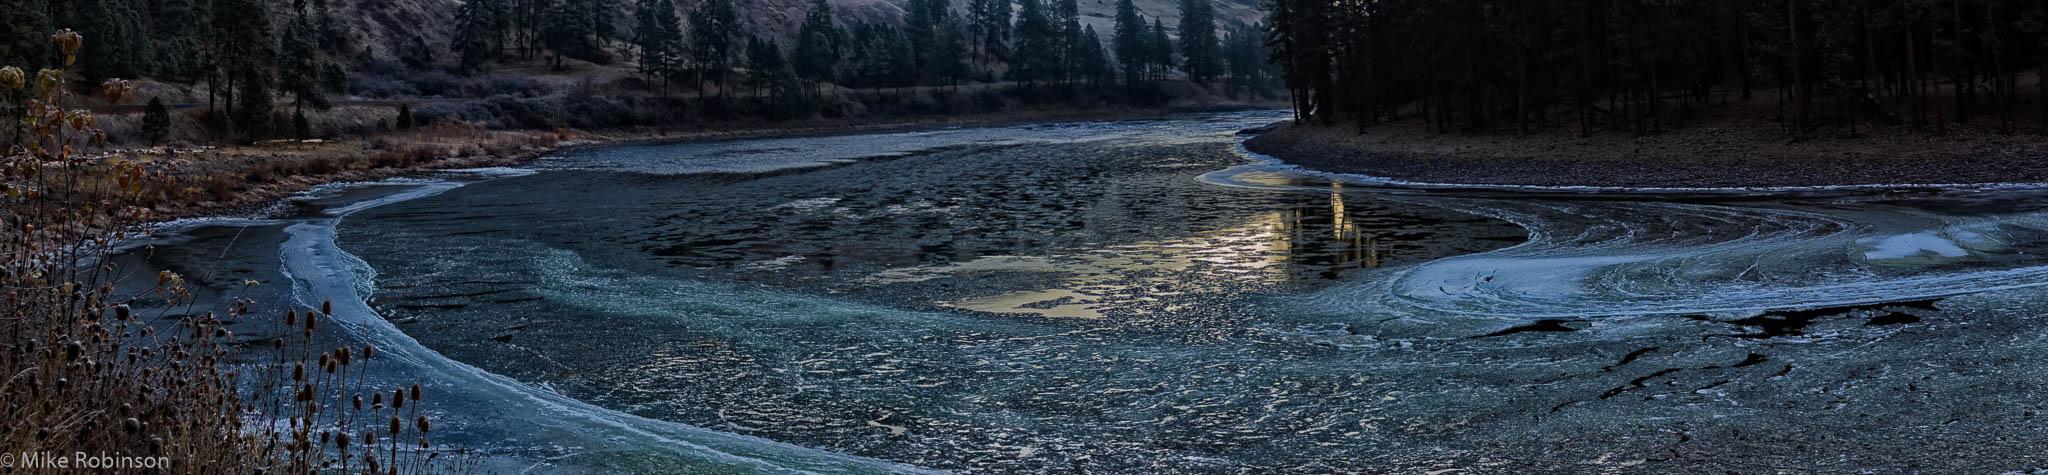 Pano_Icy_Snake_River